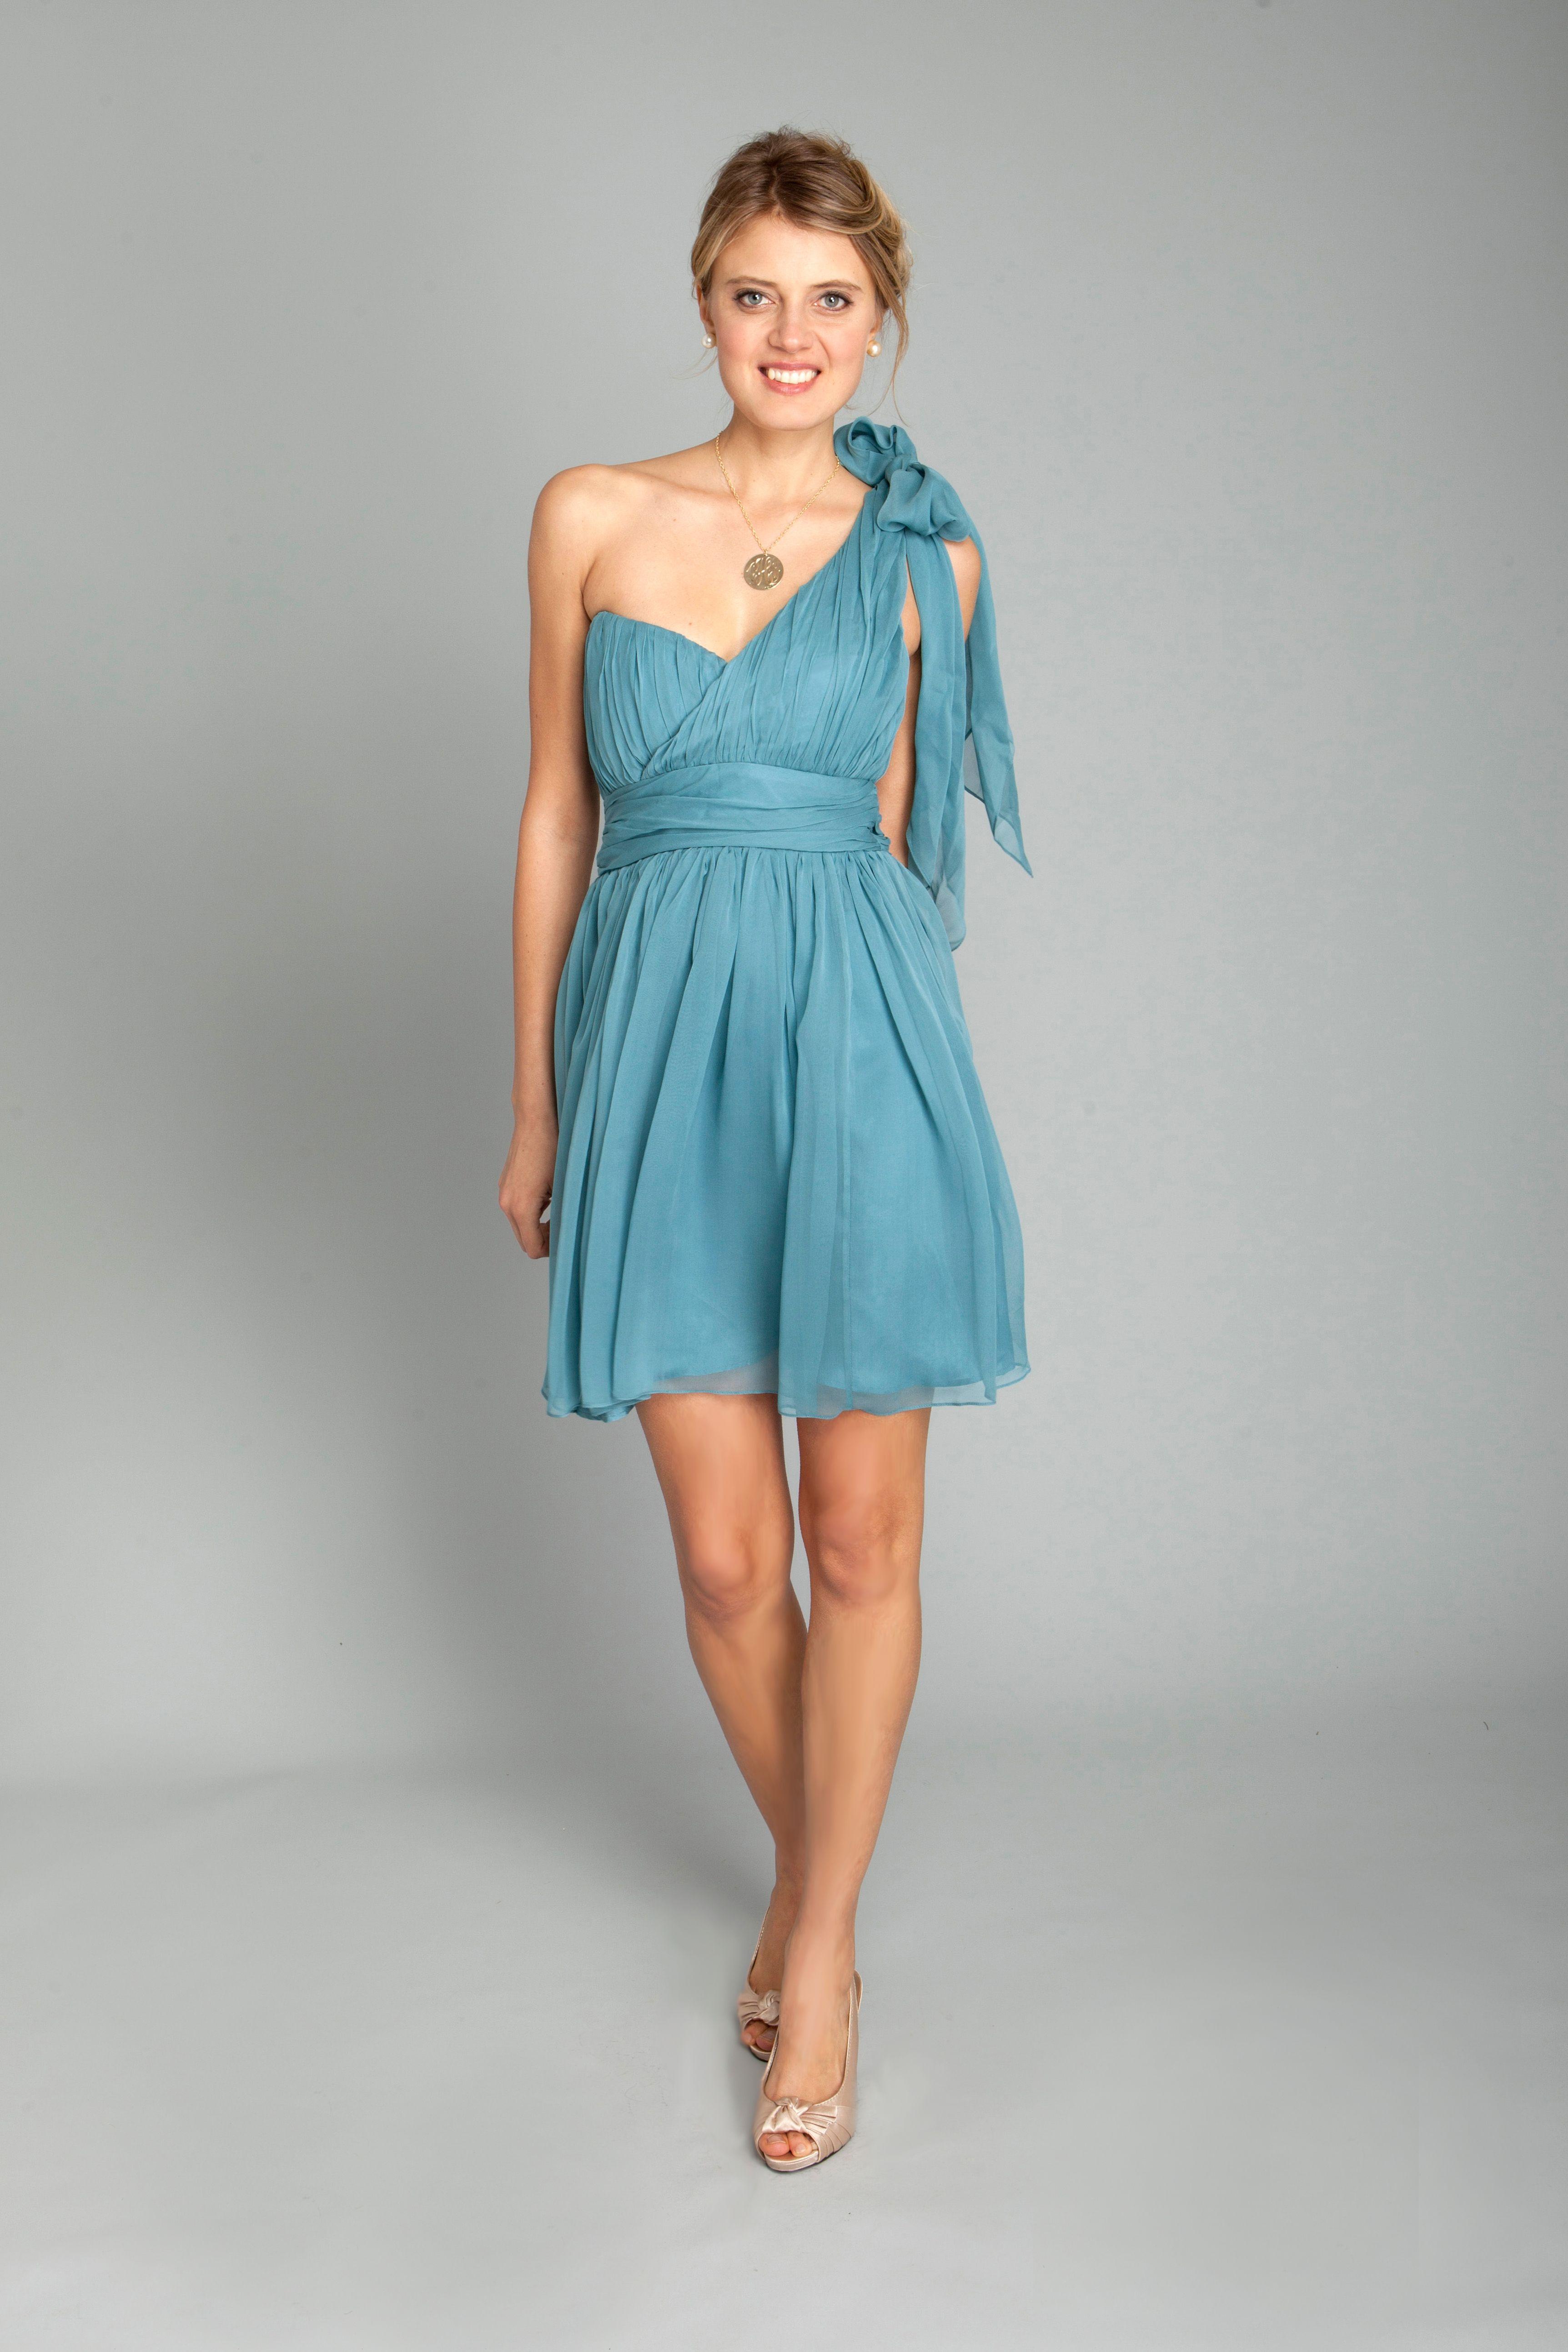 bridesmaid dress, classic, cocktail, preppy, blue, bridesmaids ...